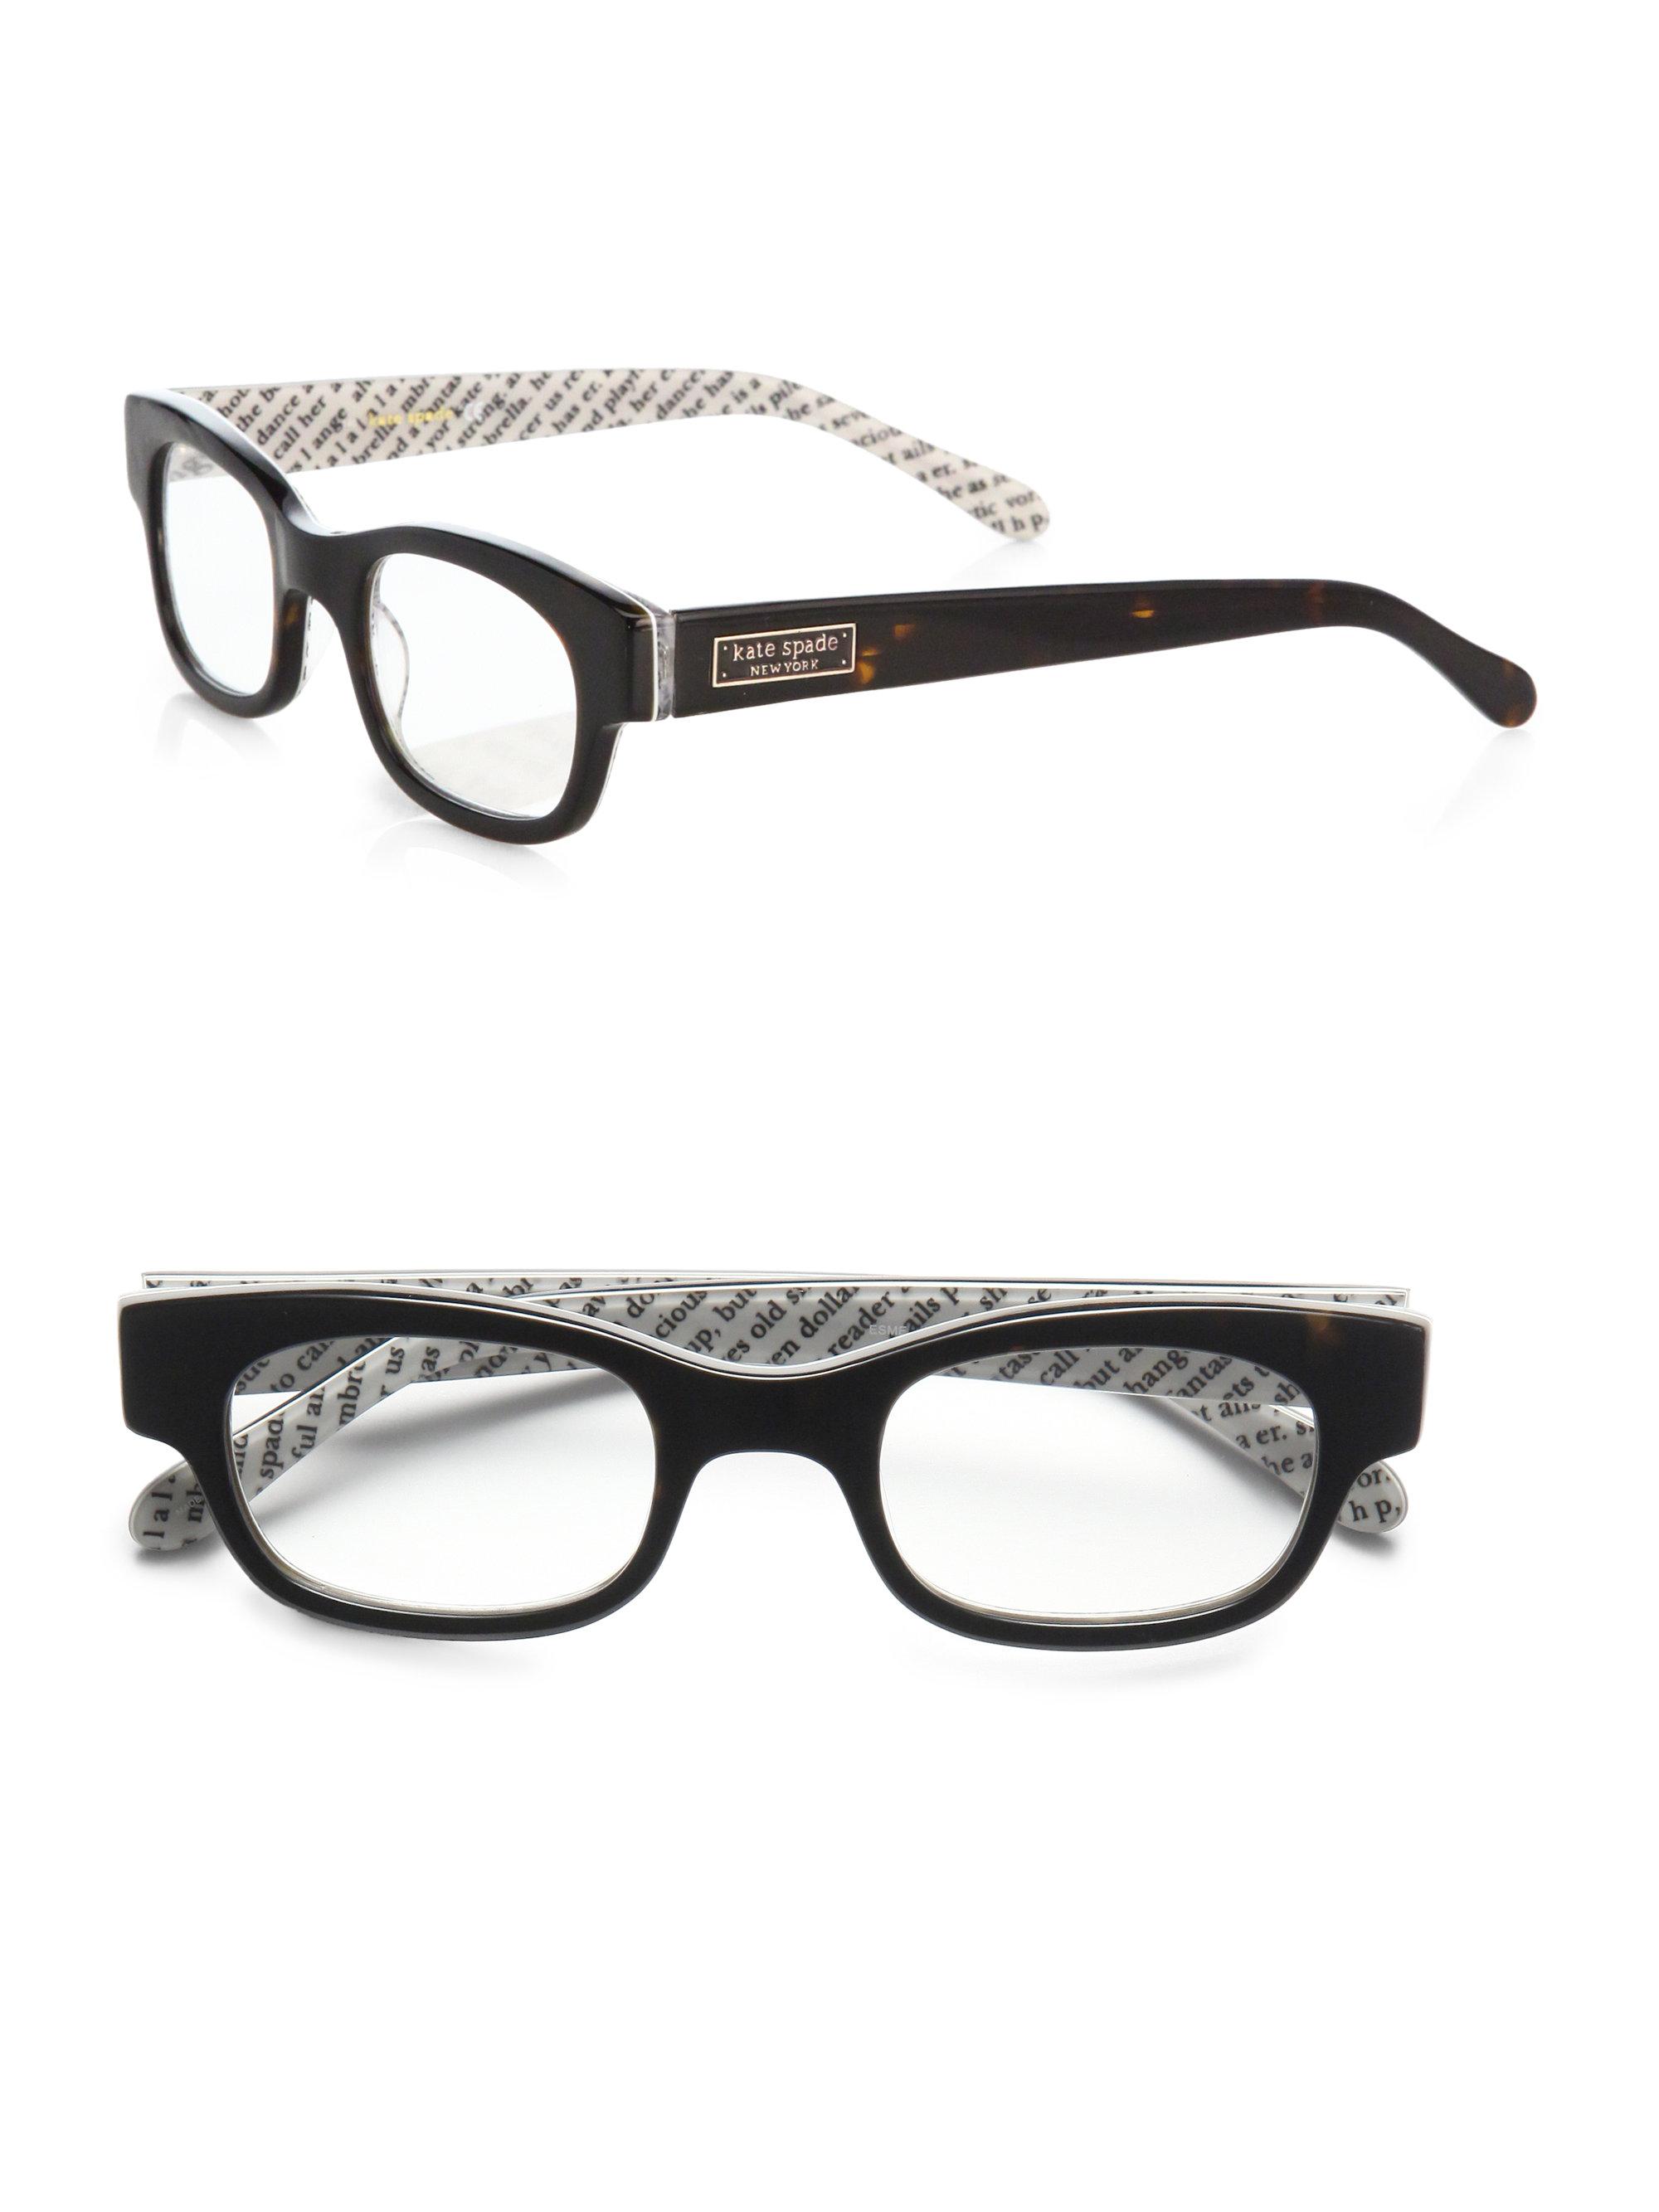 Kate Spade Glasses Frames 2013 : Kate spade Esme Acetate Rectangular Reading Glasses in ...